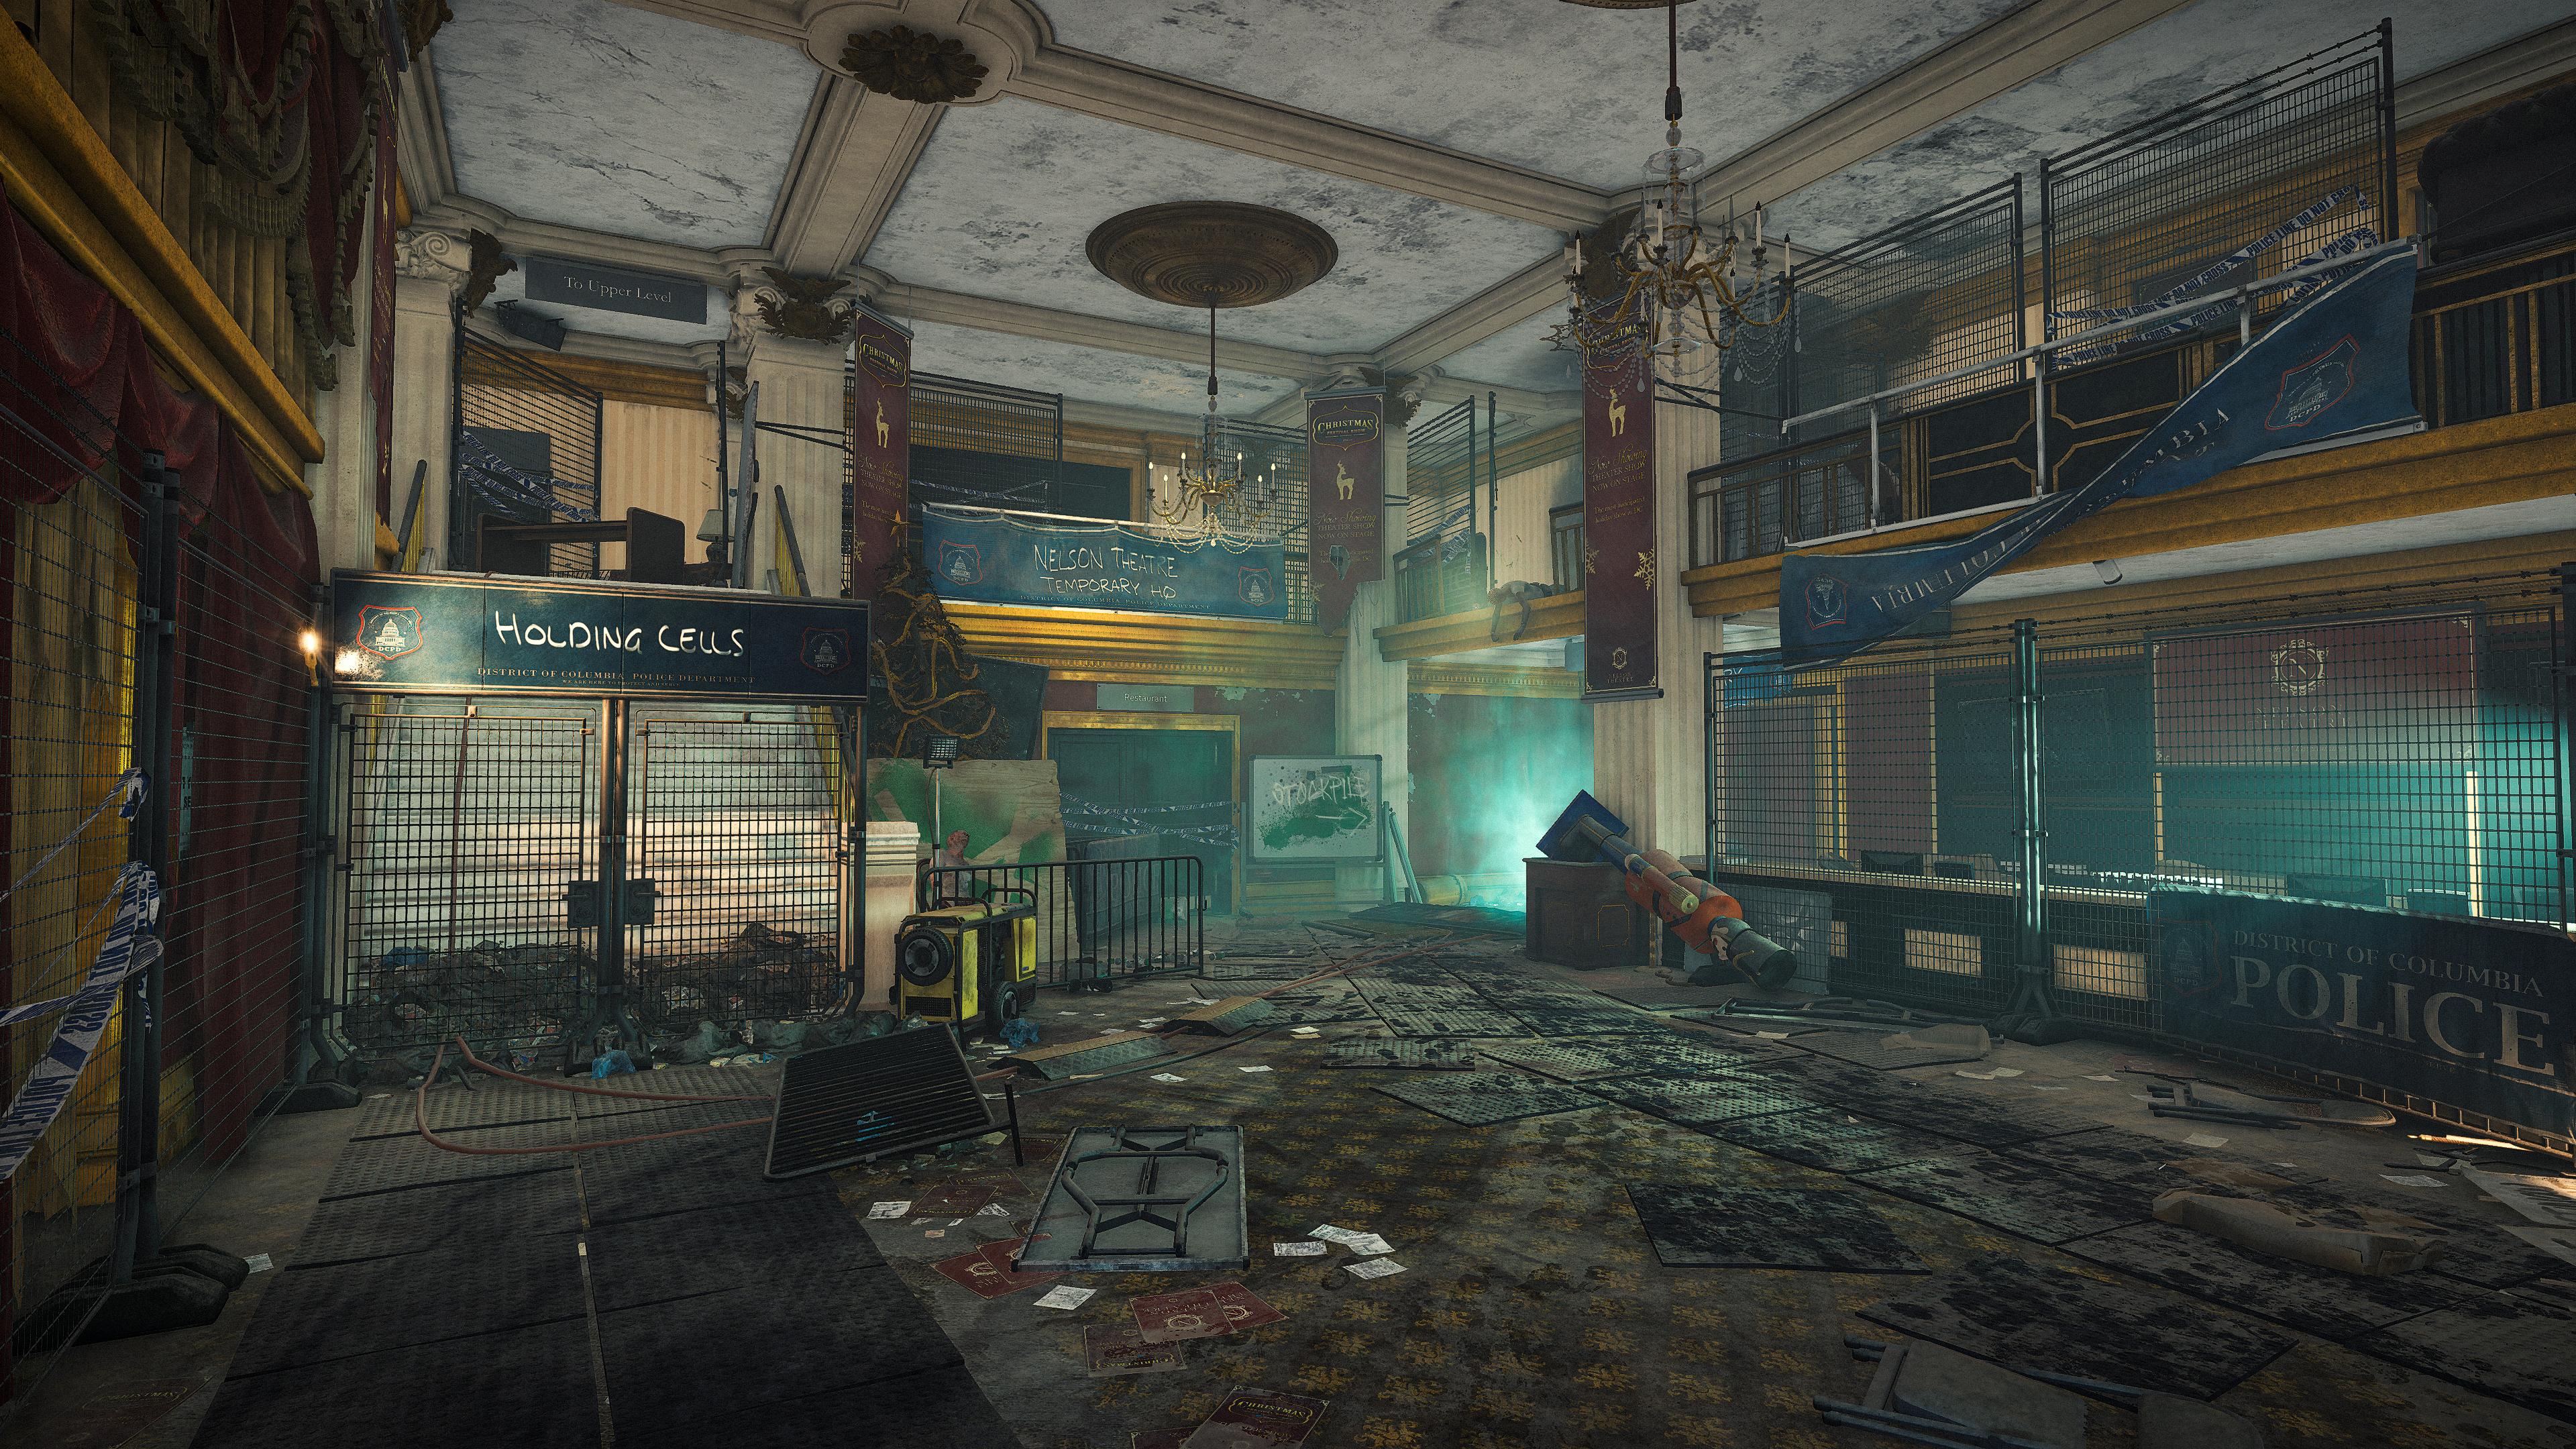 Hat Zombie-Arme-Trilogie Matchmaking